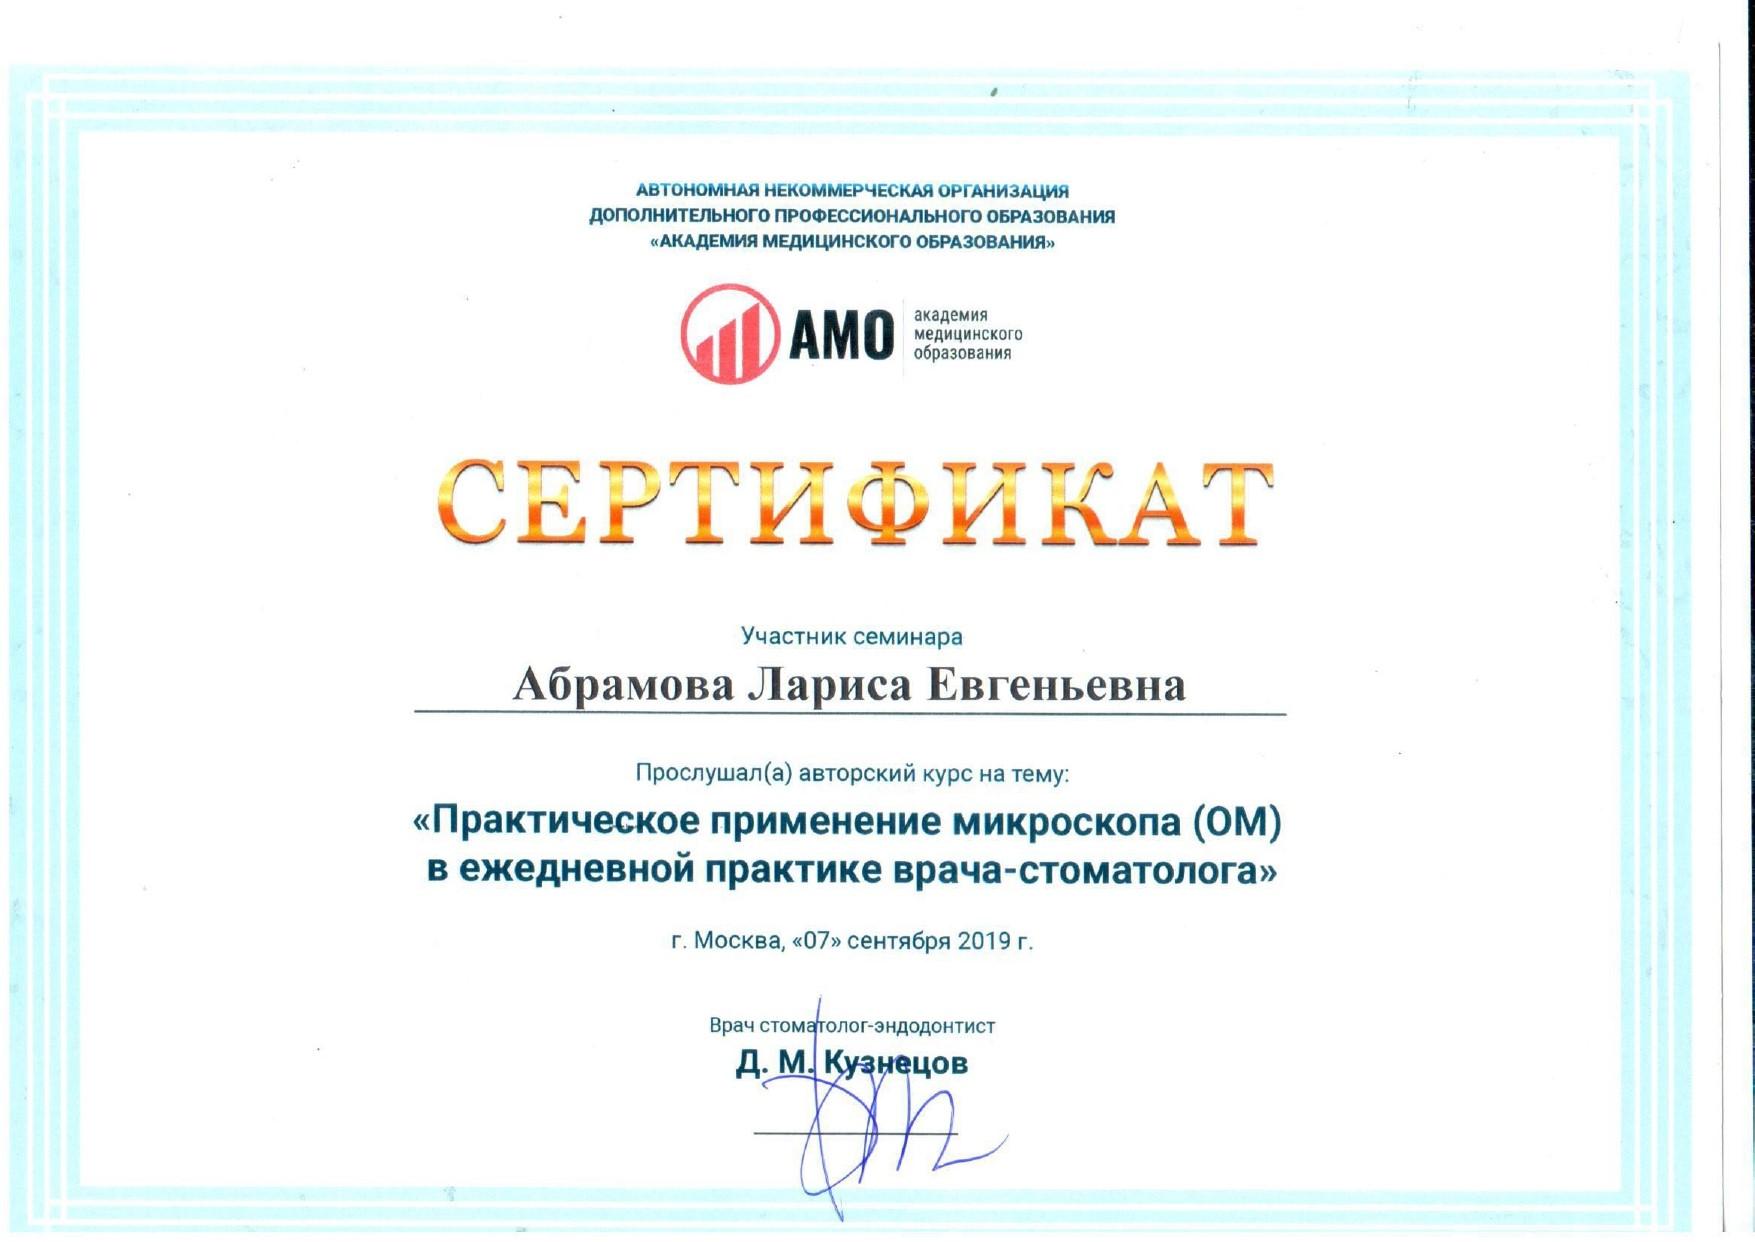 Абрамова Лариса Евгеньевна - Сертификат